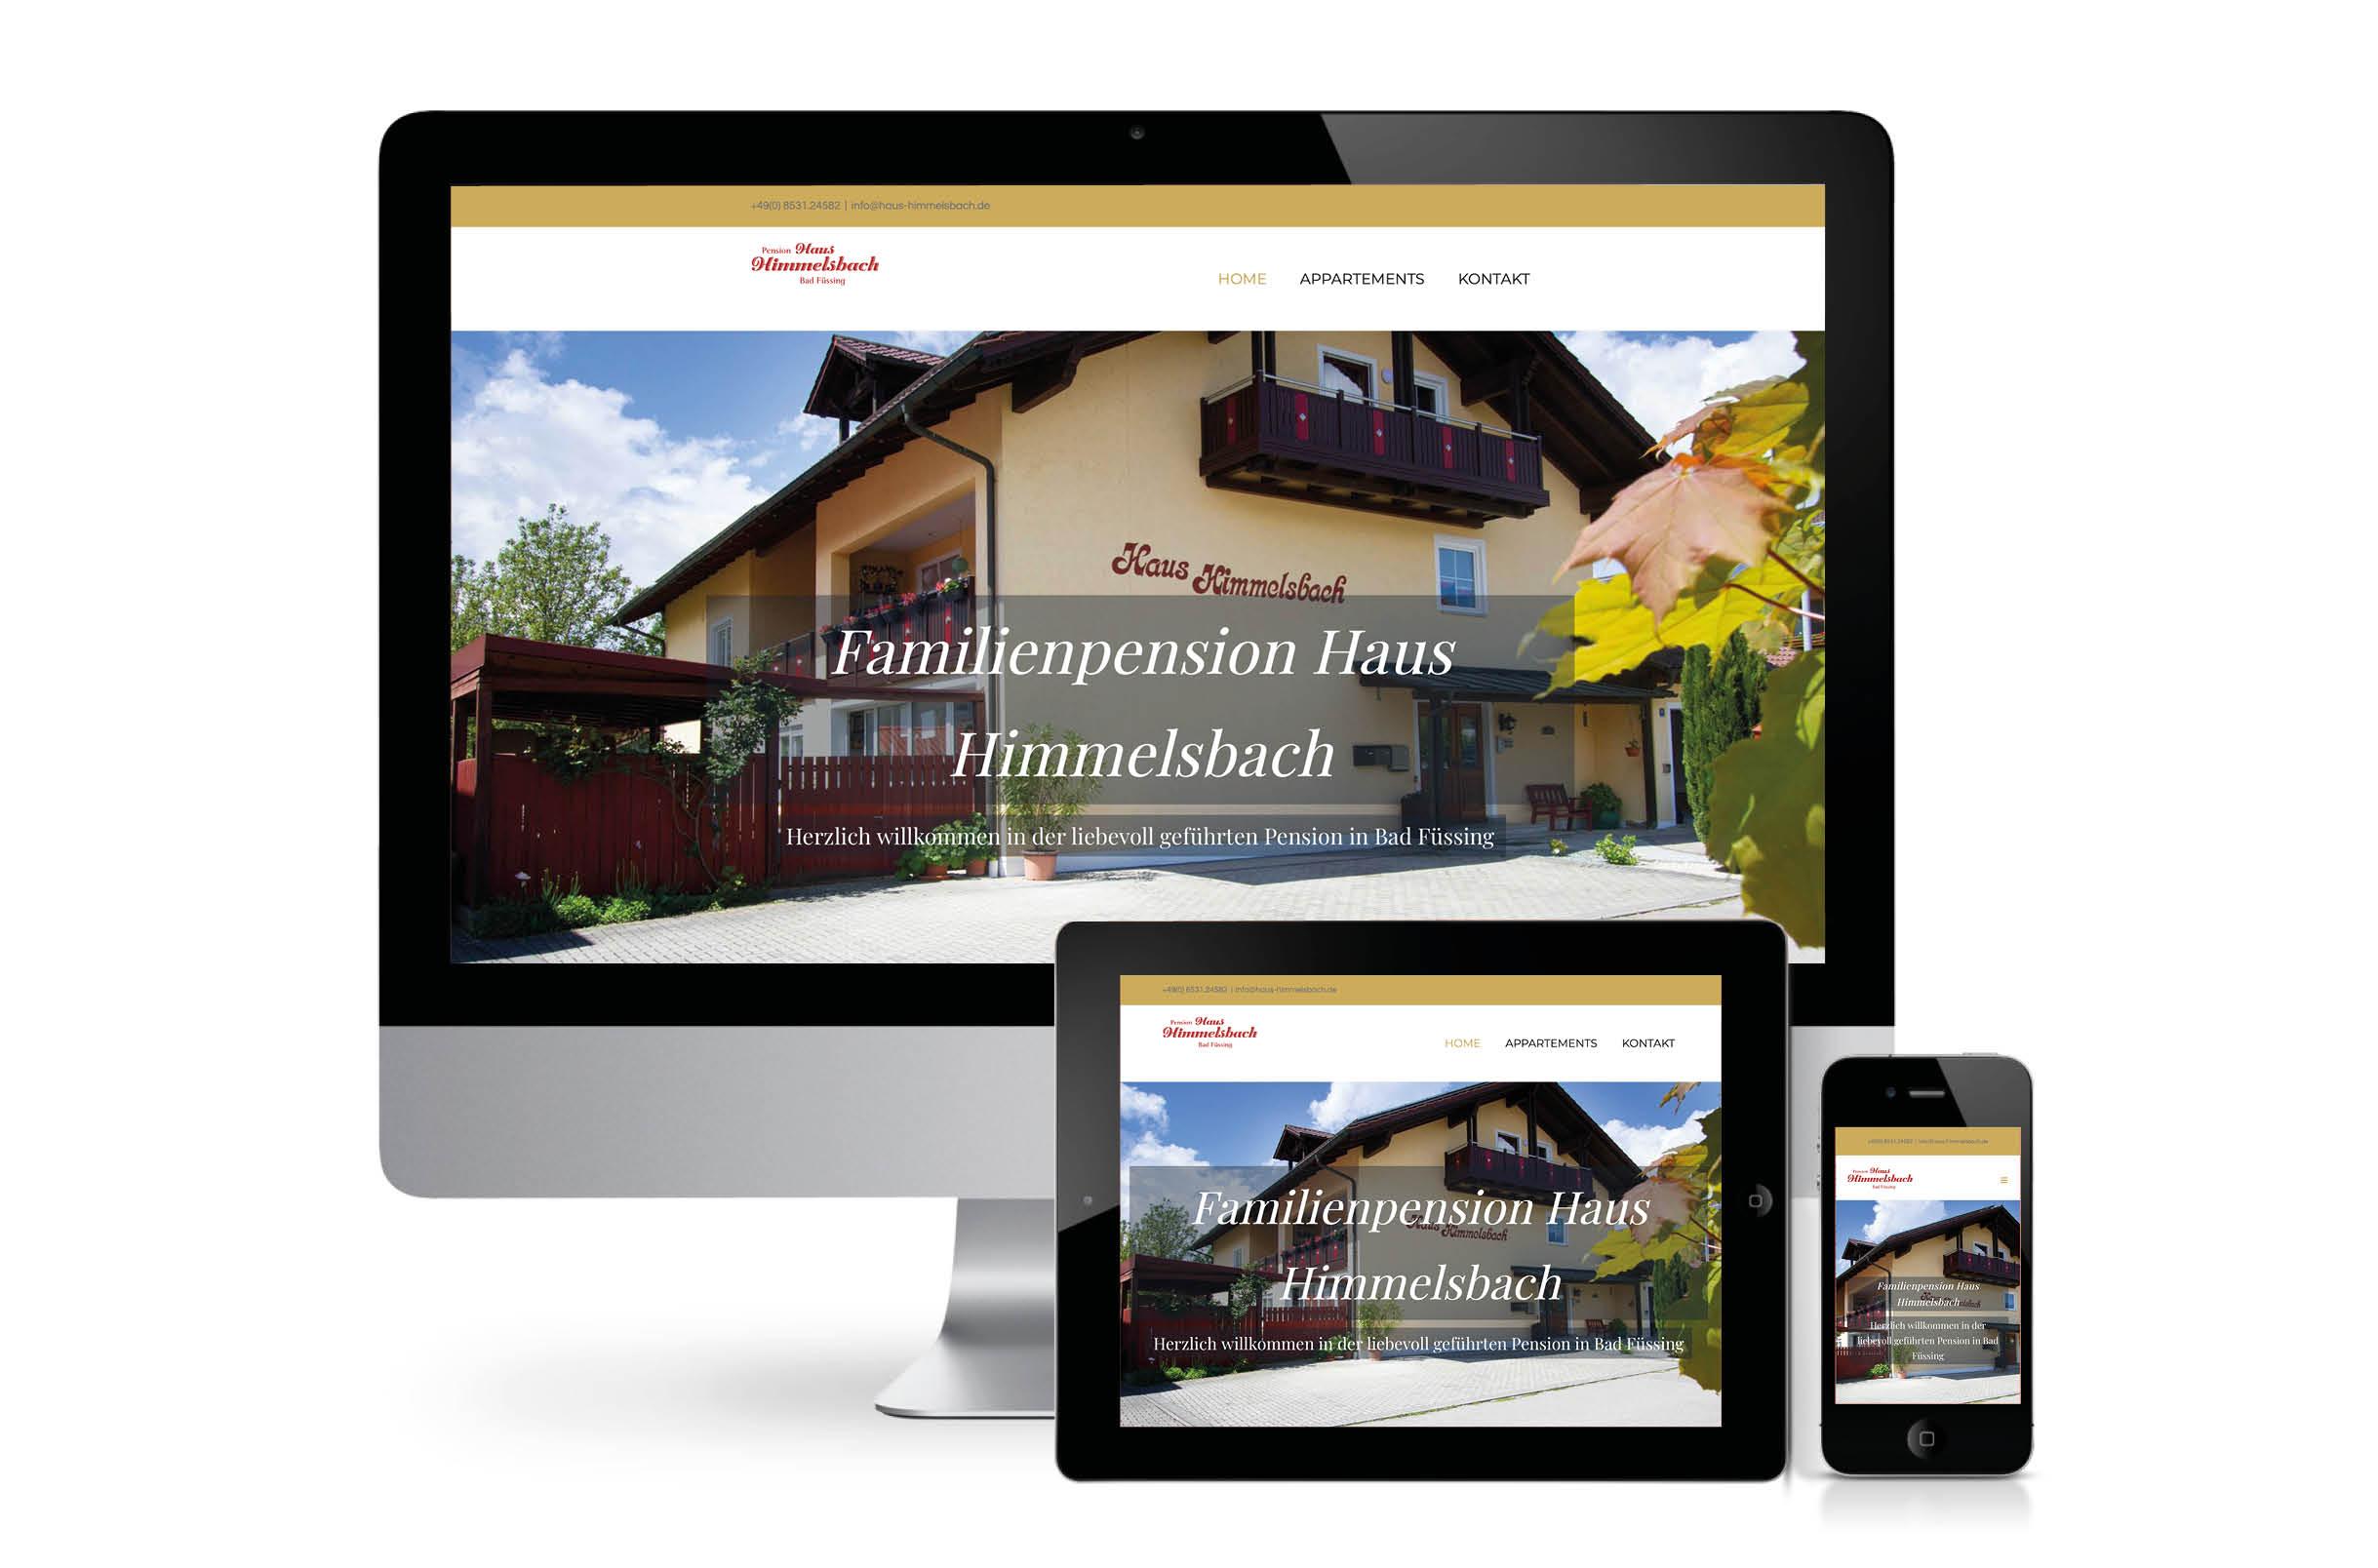 Erholung ab der ersten Minute  – Pension Haus Himmelsbach